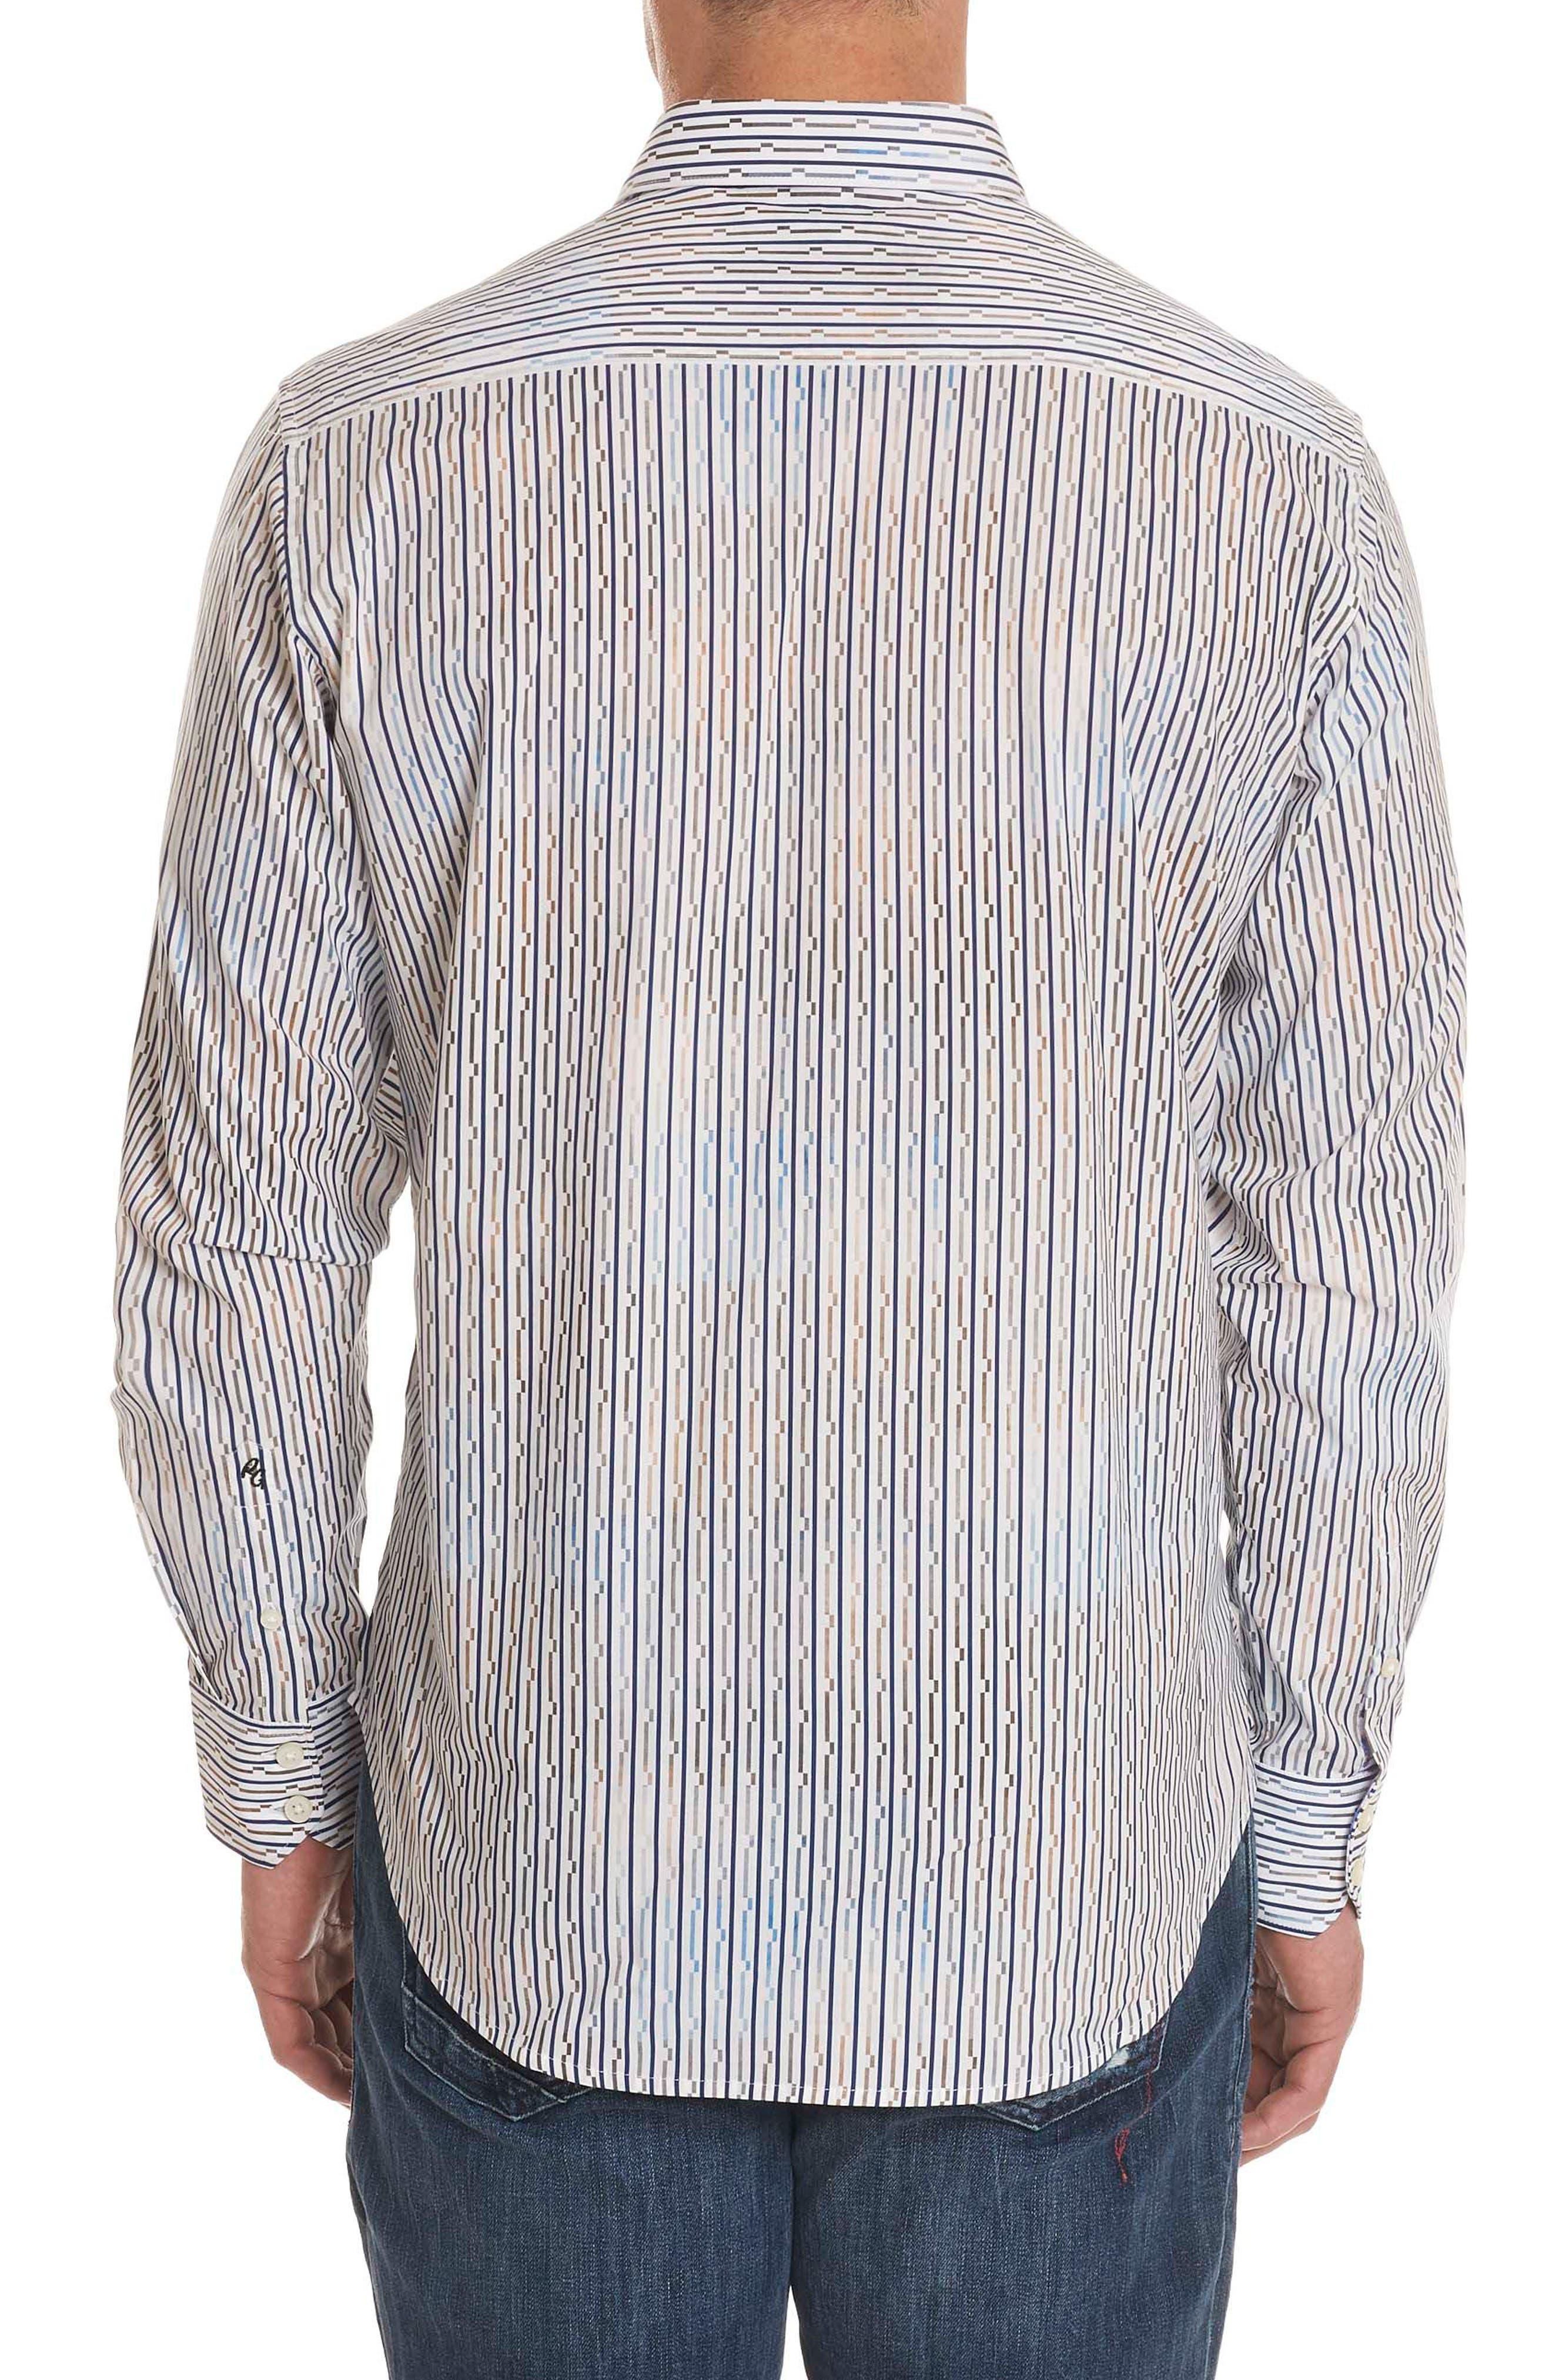 Trinidad Classic Fit Sport Shirt,                             Alternate thumbnail 2, color,                             Multi